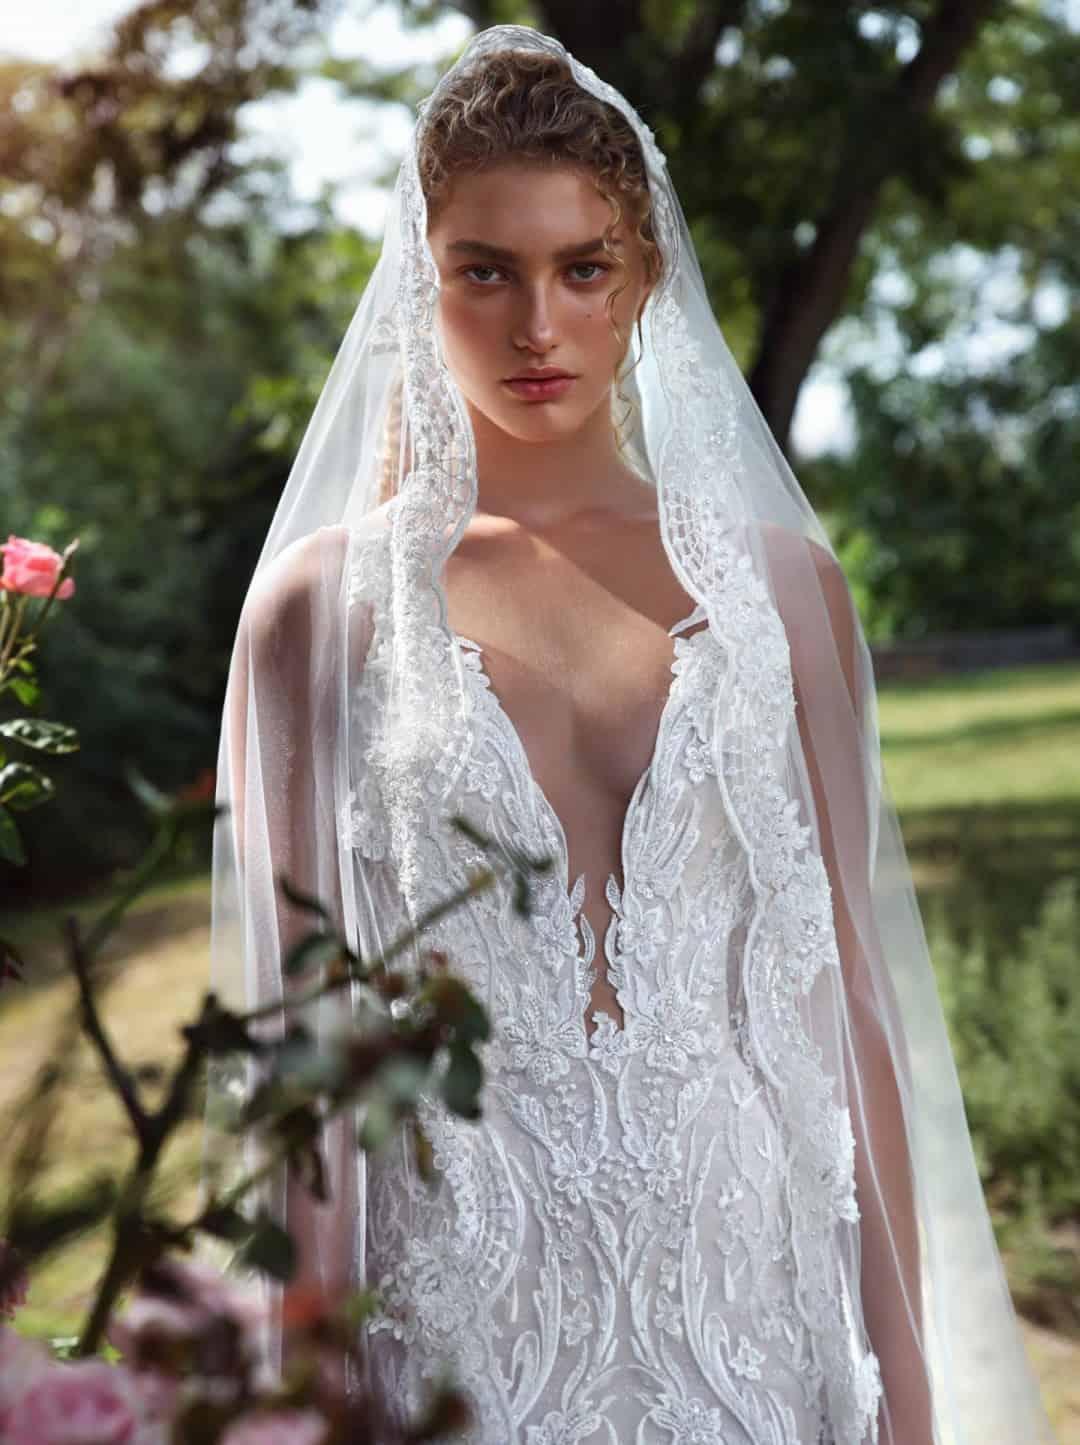 Haute Couture esküvöi ruhák - G-207-front-medium